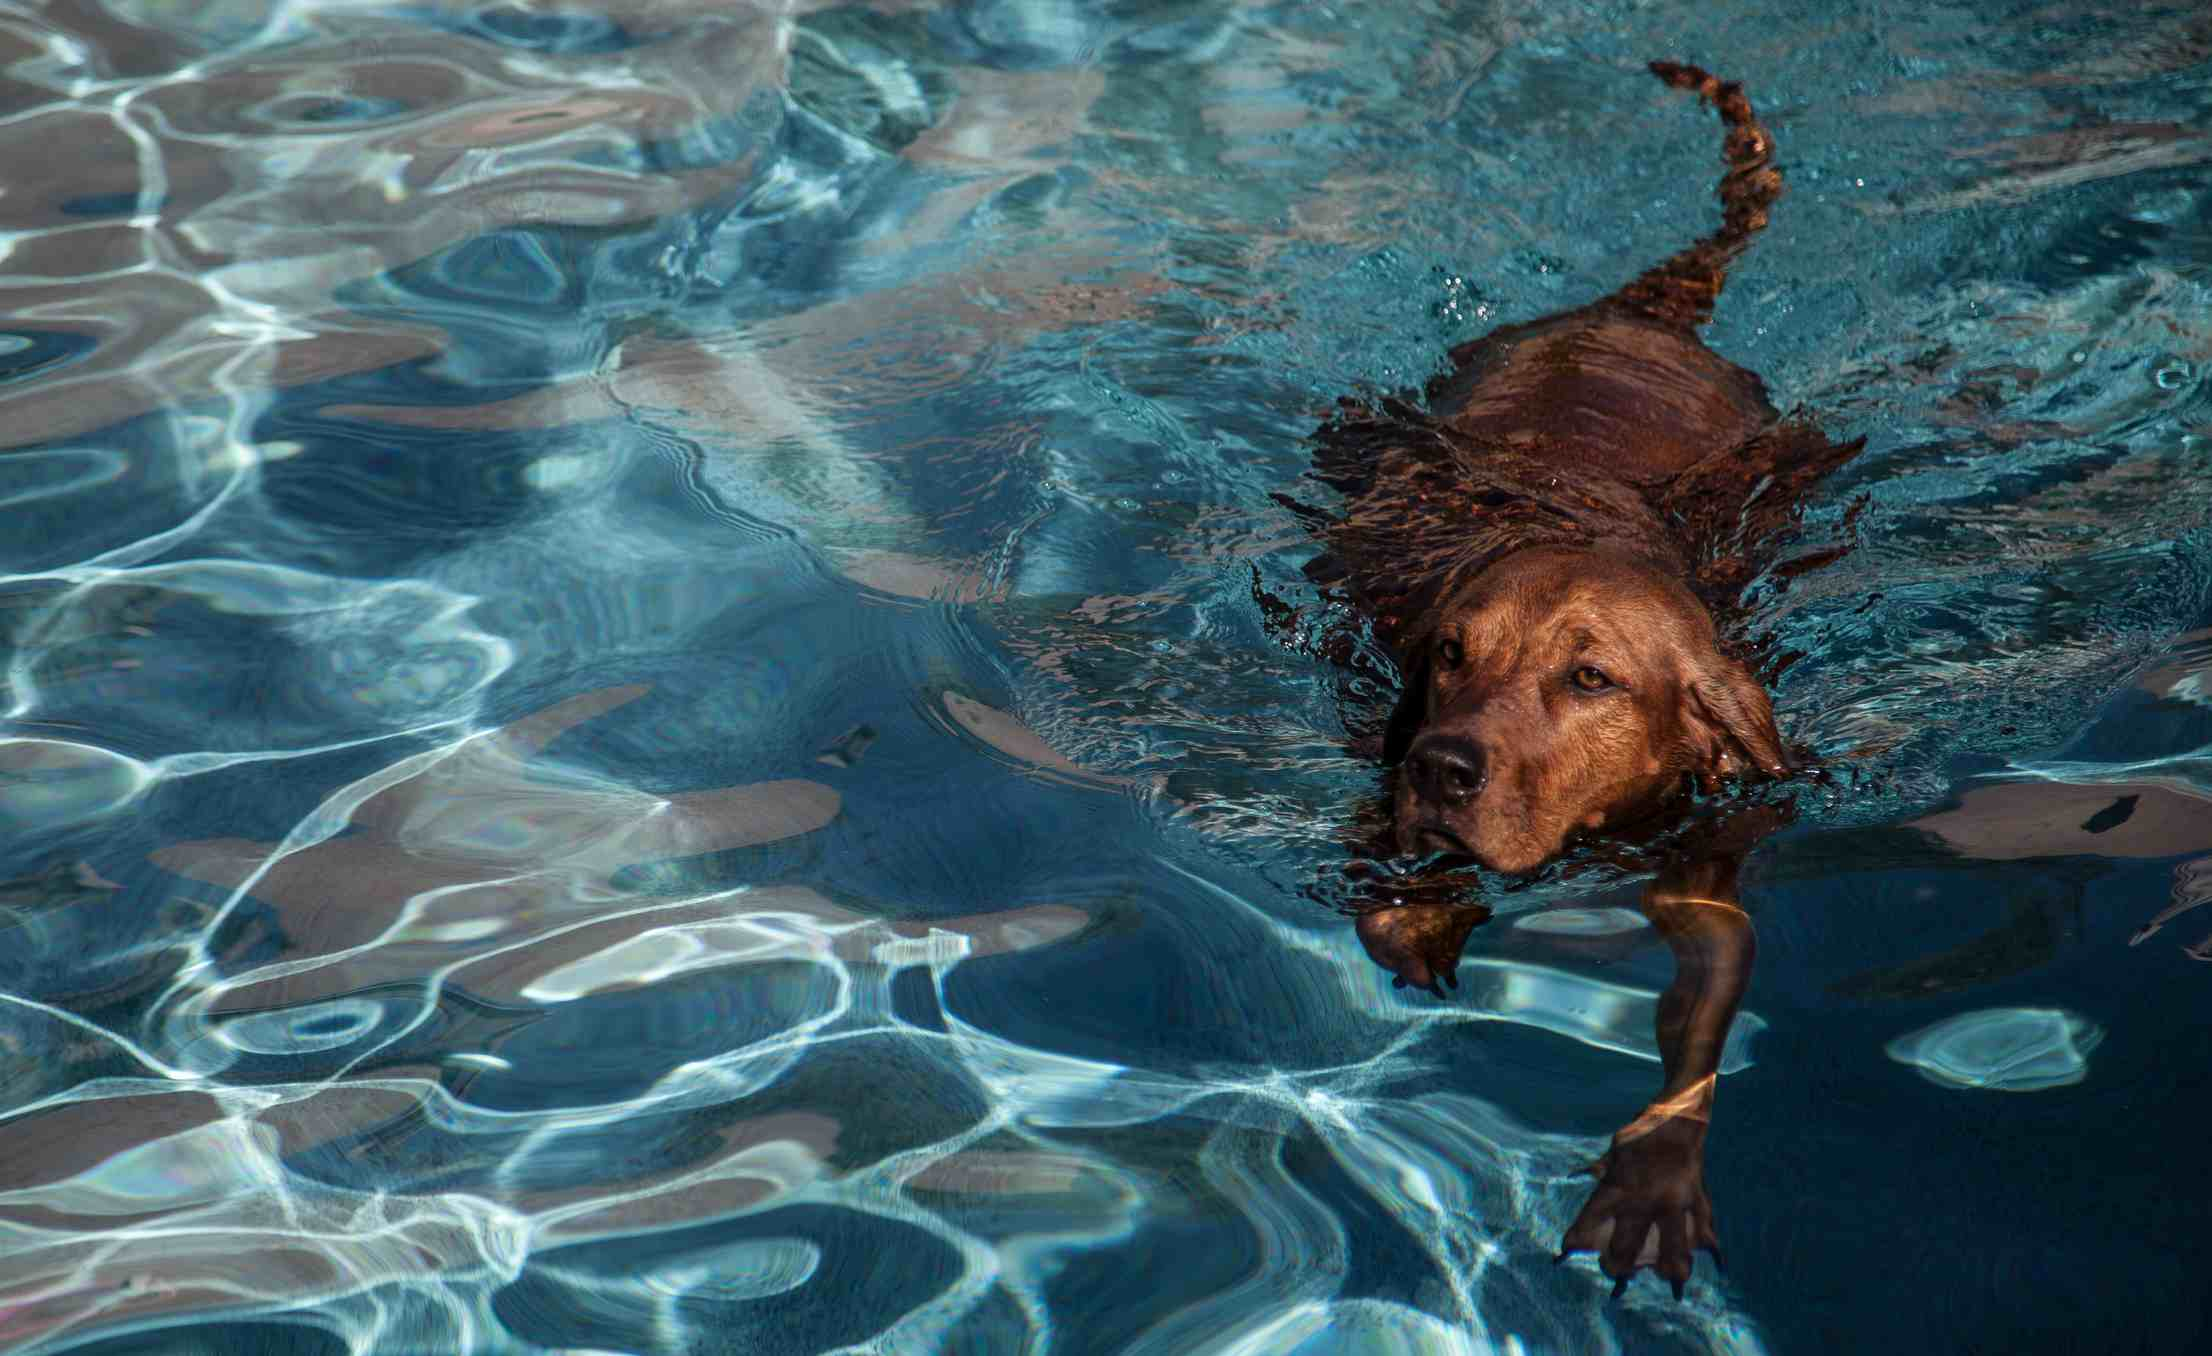 Redbone Coonhound swimming